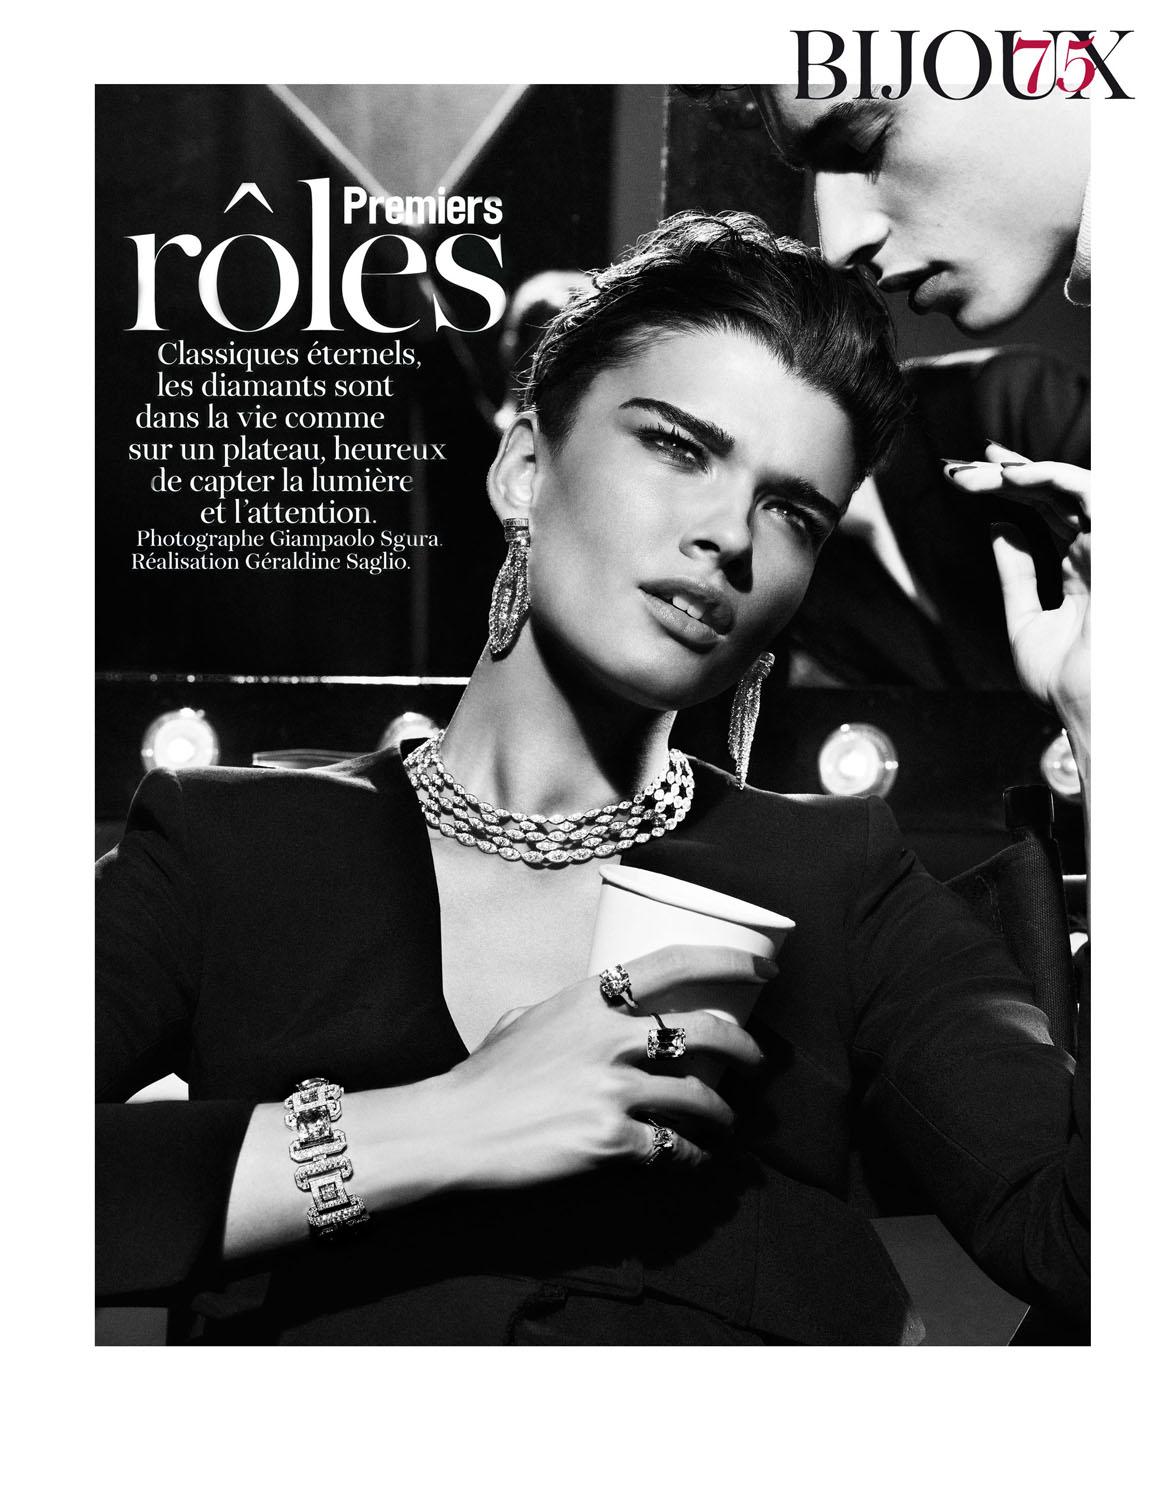 9bb4886cf80 Crystal Renn   Adrien Sahores by Giampaolo Sgura for Vogue Paris